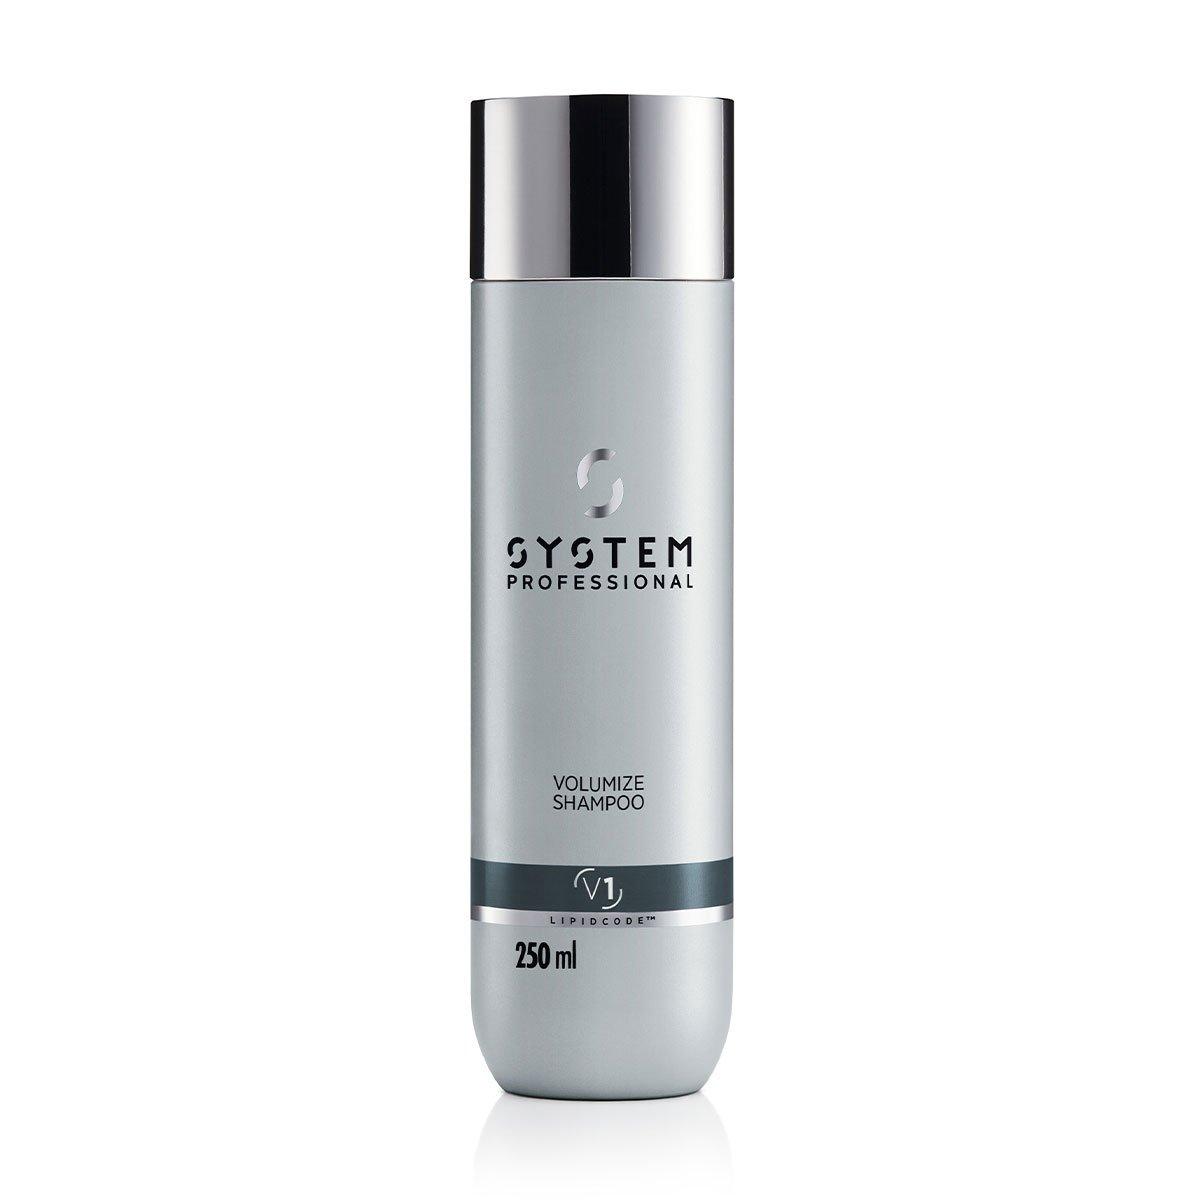 System Professional Volumize Shampoo